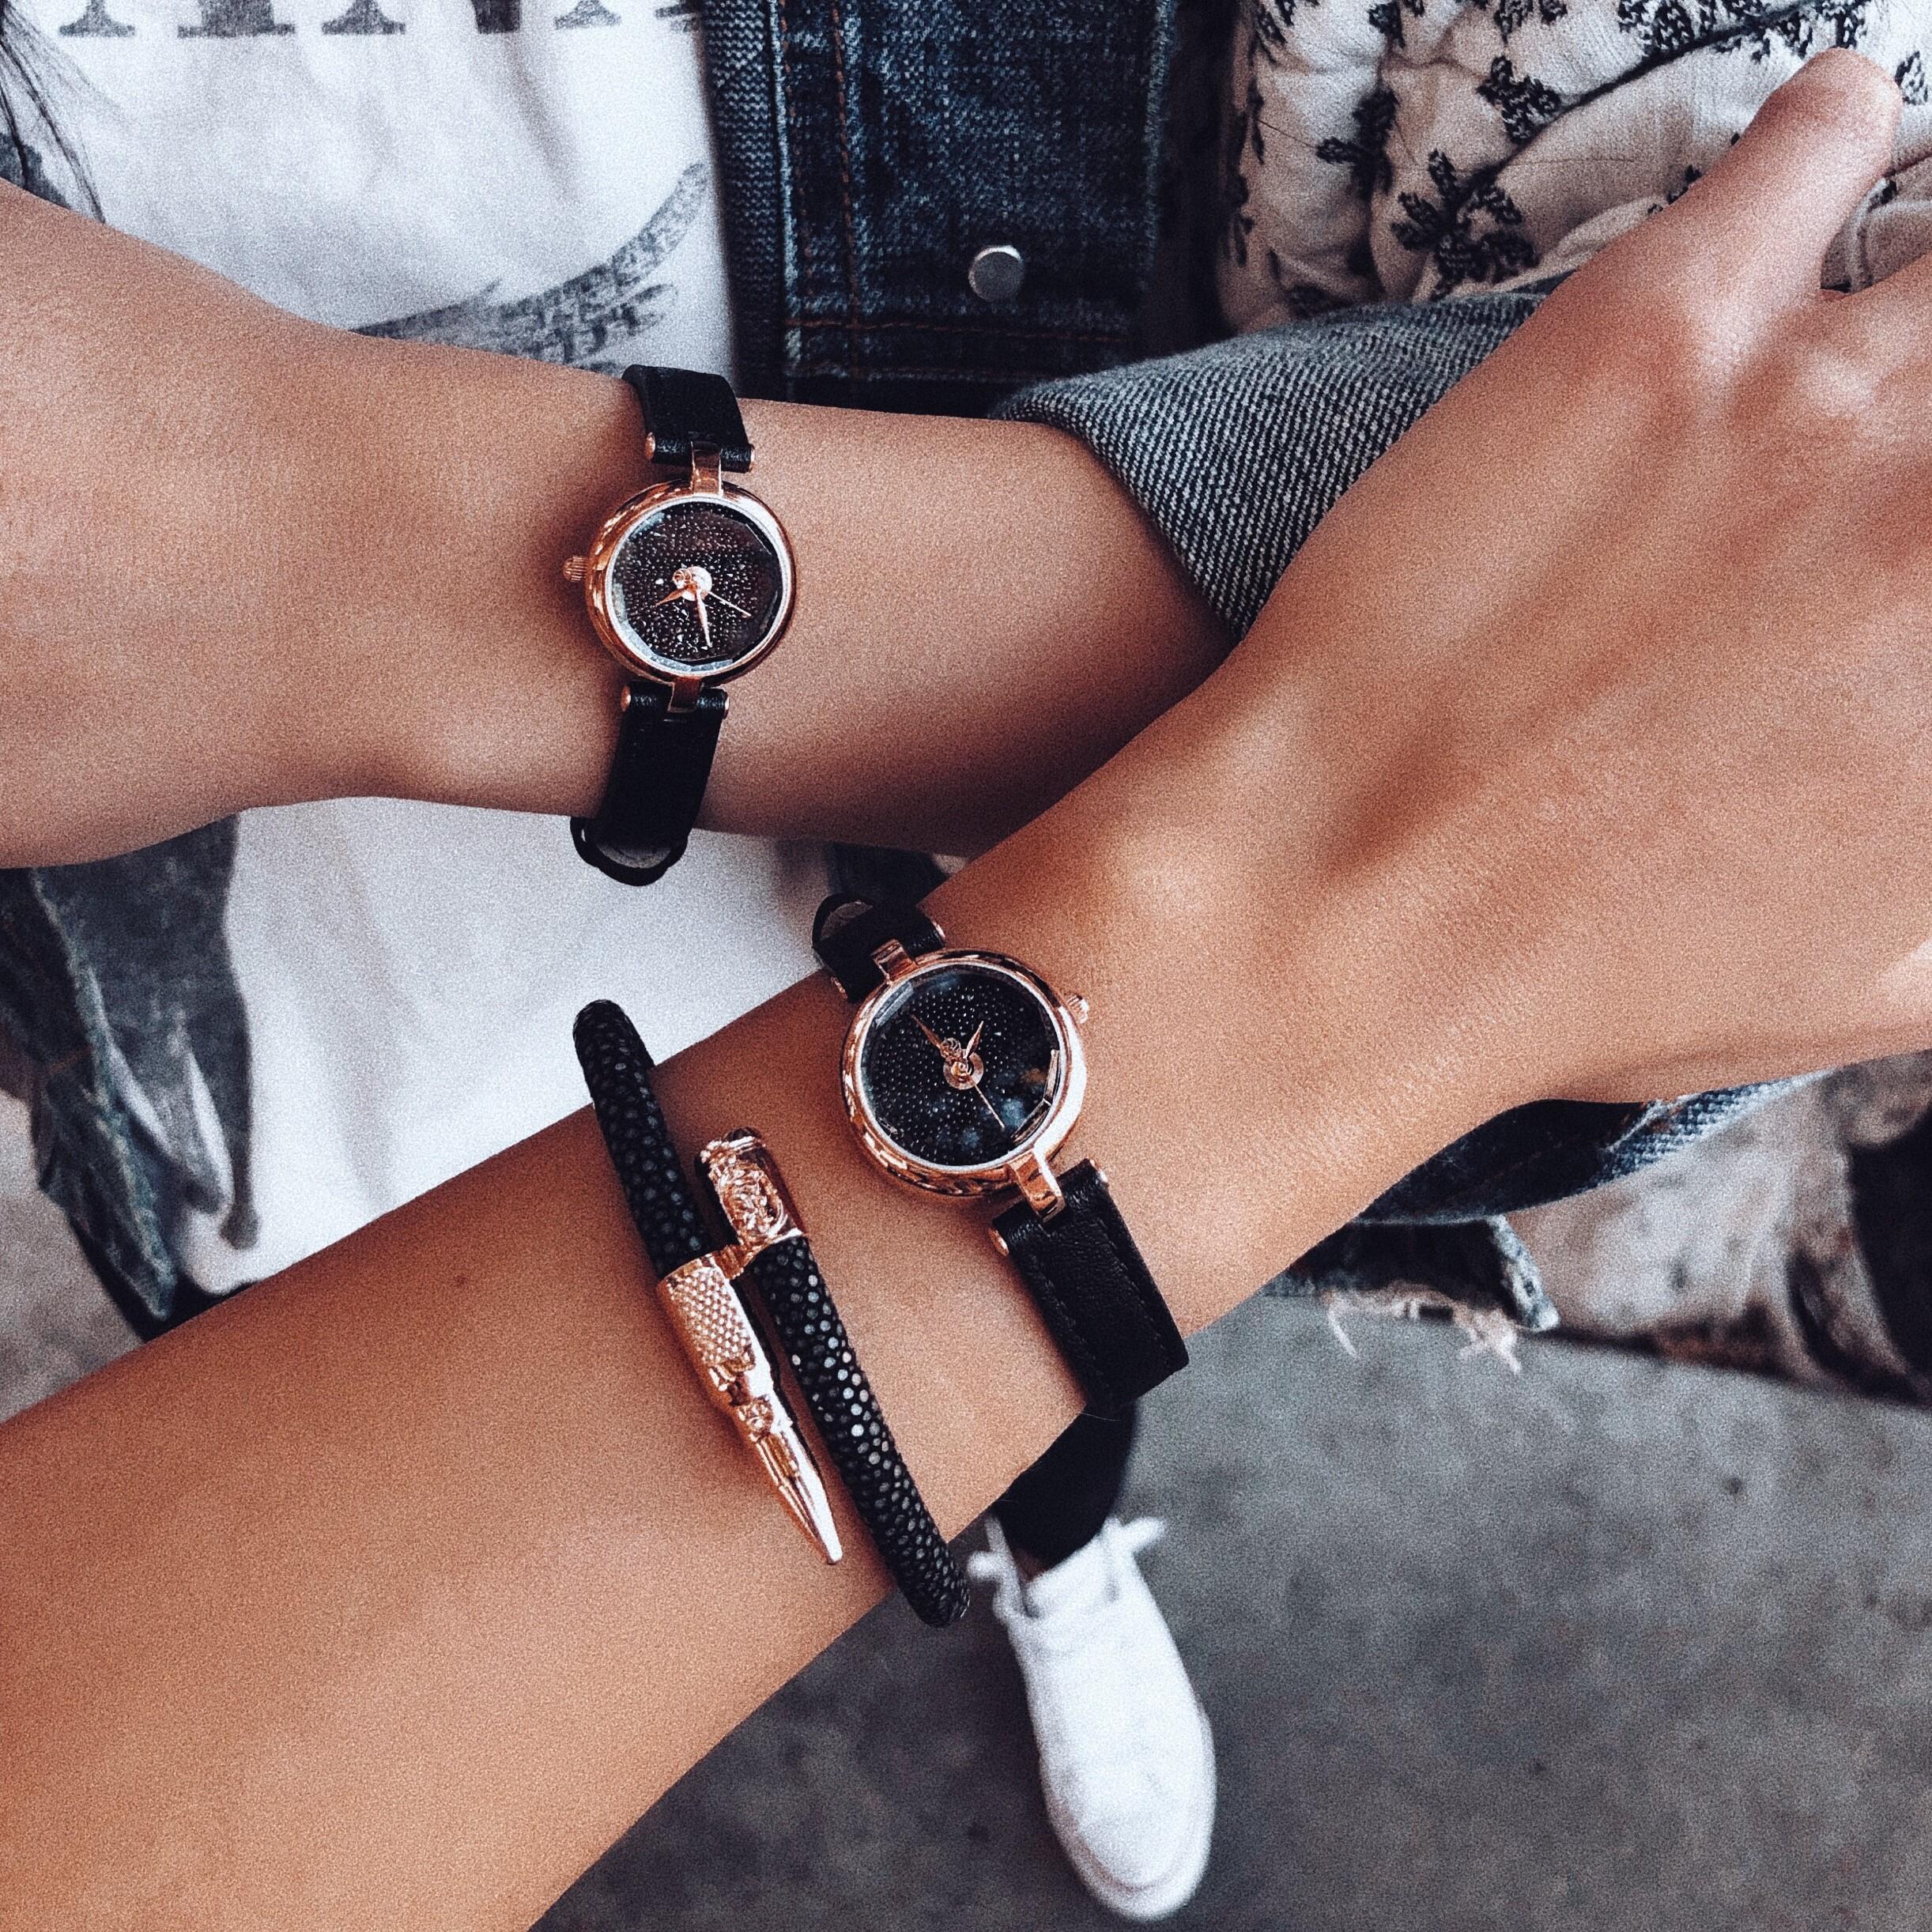 Women wearing Black Stingray Bracelet and watches